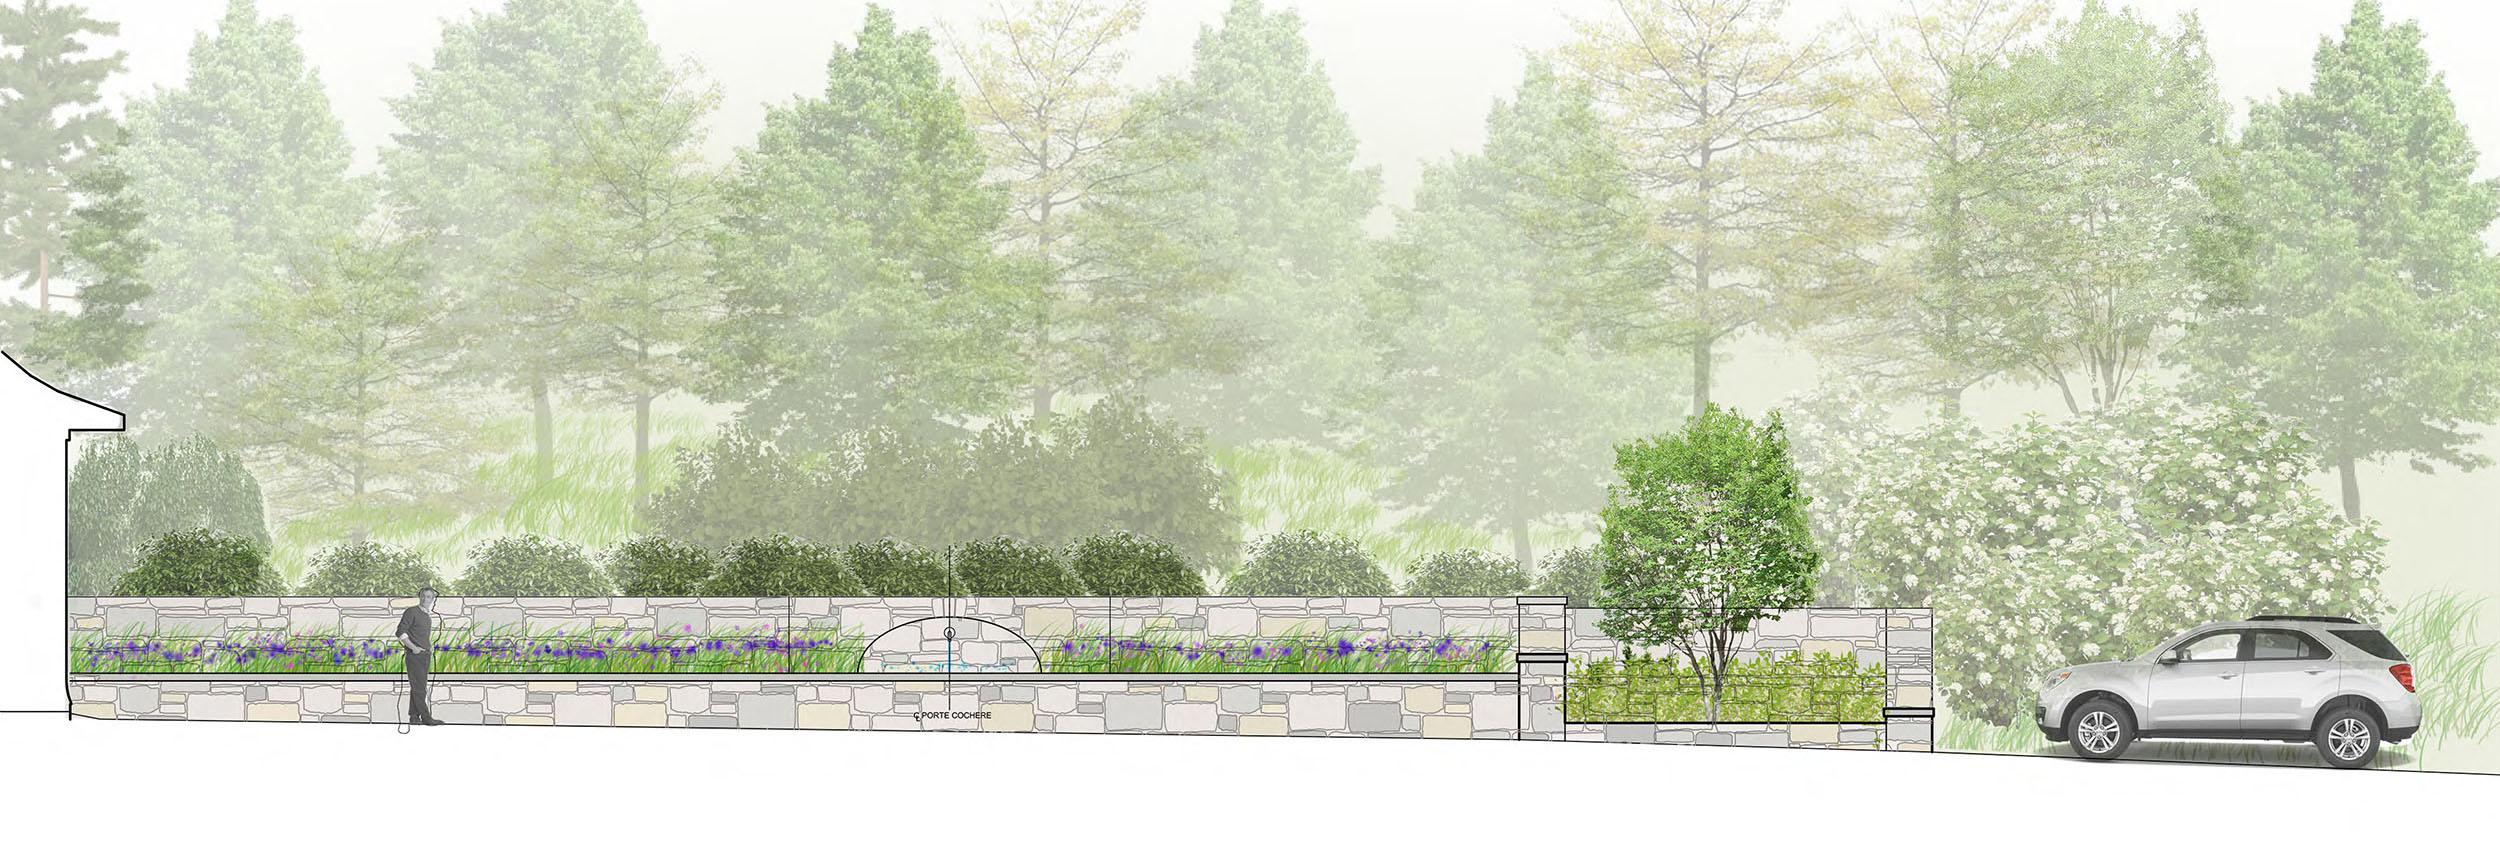 Section3-Grounded_charlottesville-landscape-architect.jpg